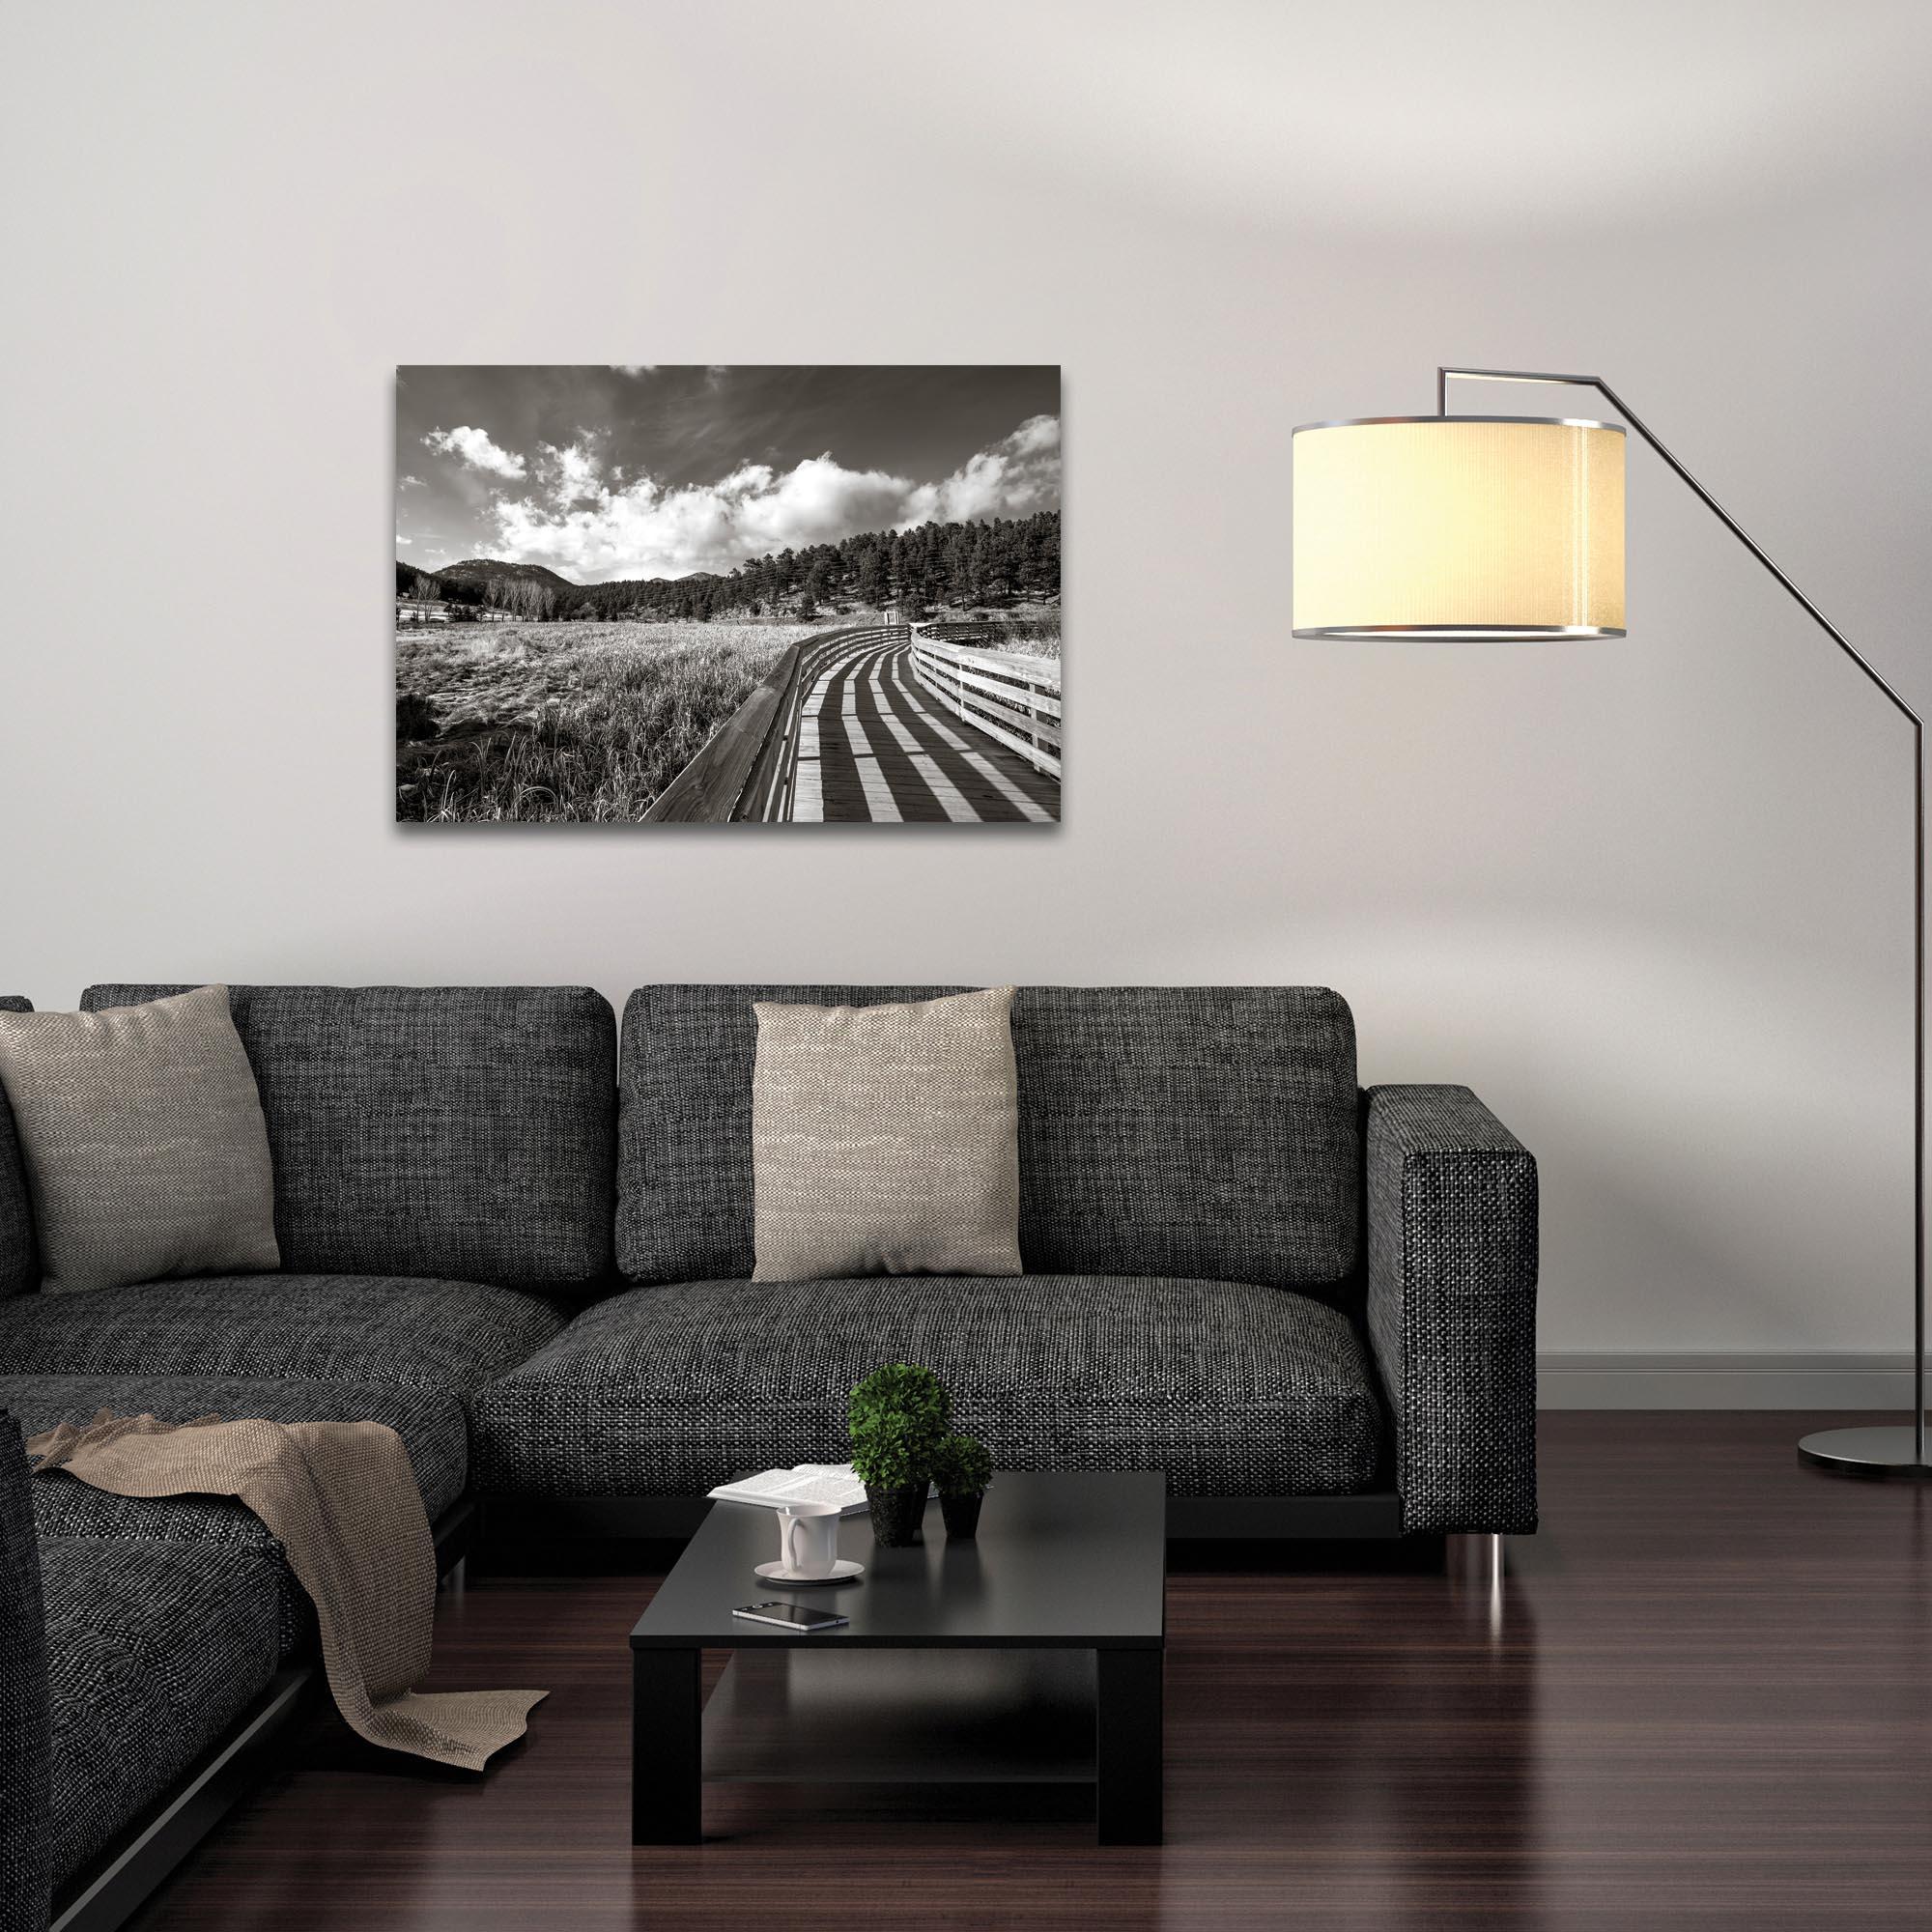 Film Noir Wall Art 'Wooden Walkway' - Dramatic Landscape Decor on Metal or Plexiglass - Lifestyle View